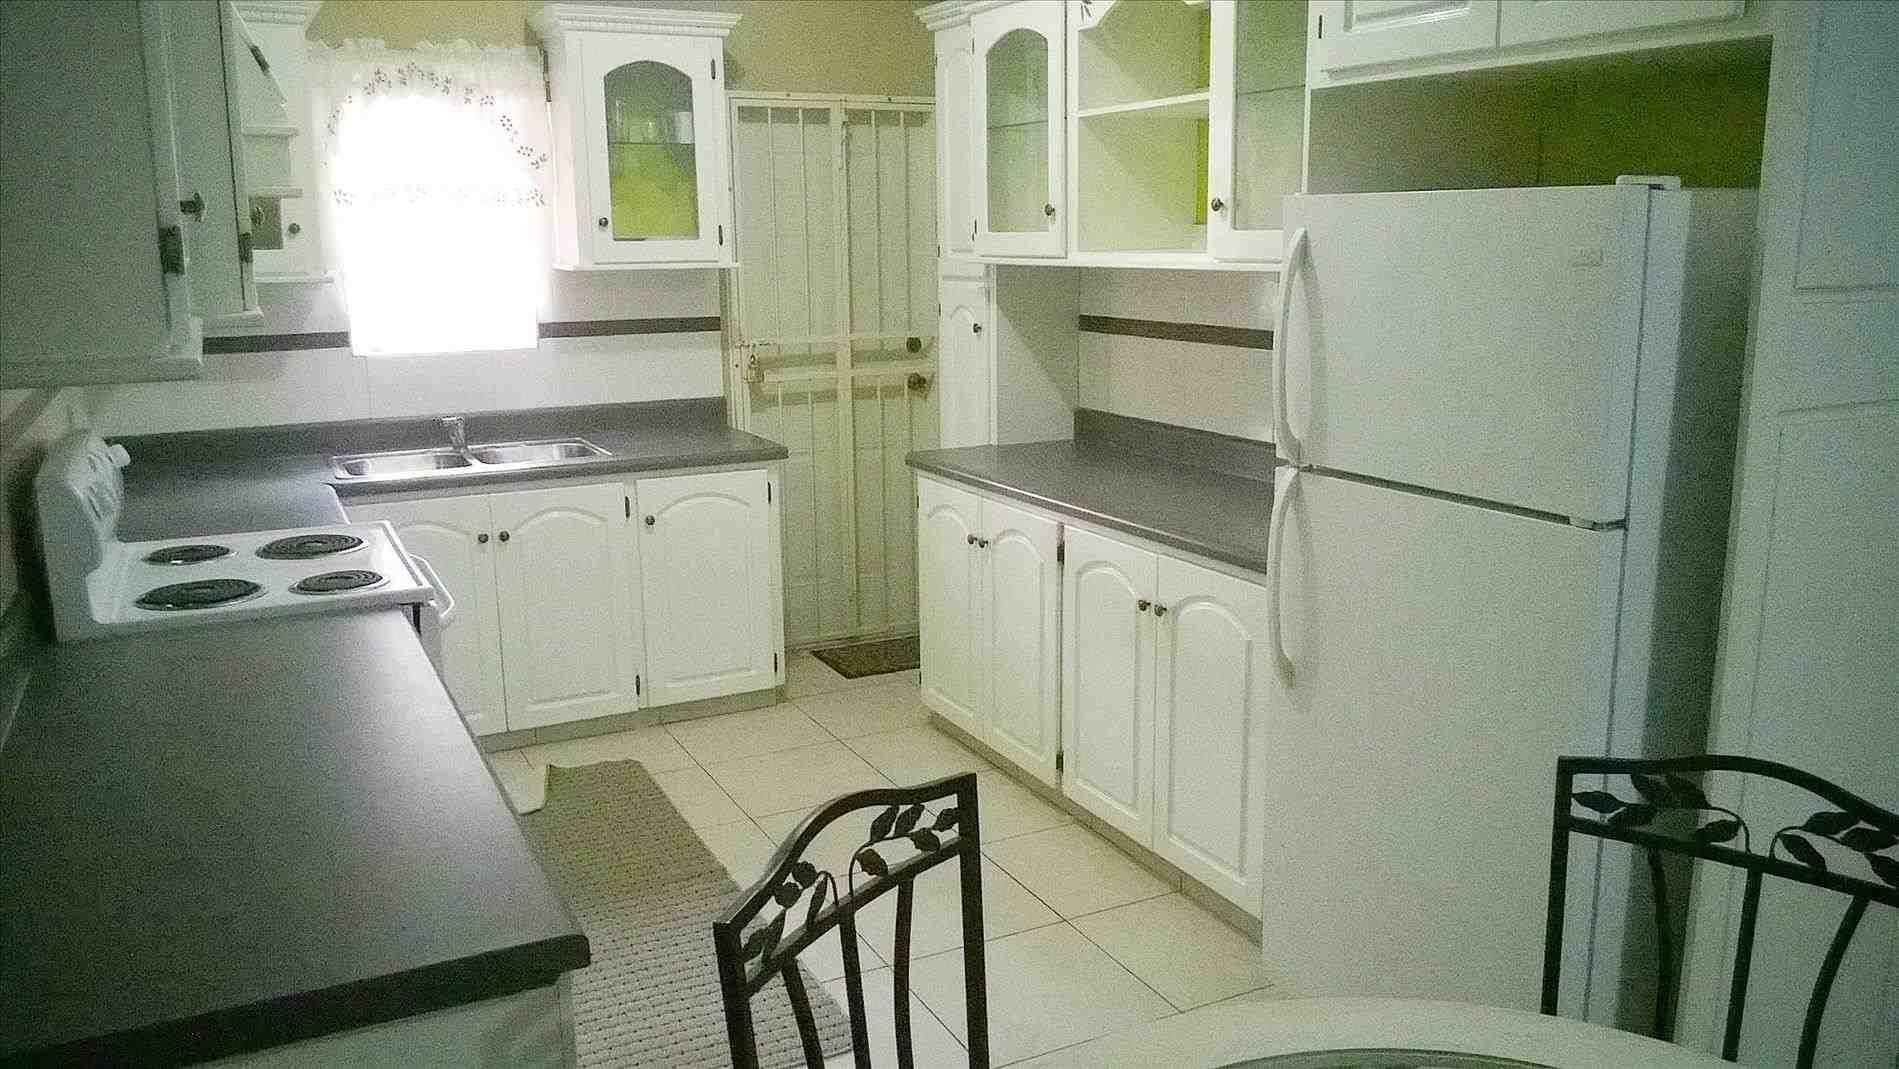 Trinidad Apartment Hdc Trinidad Housing Development Corporation 2016 2 Bedroom Apartment For Rent Quesnel Apartment Apartments For Rent 2 Bedroom Apartment